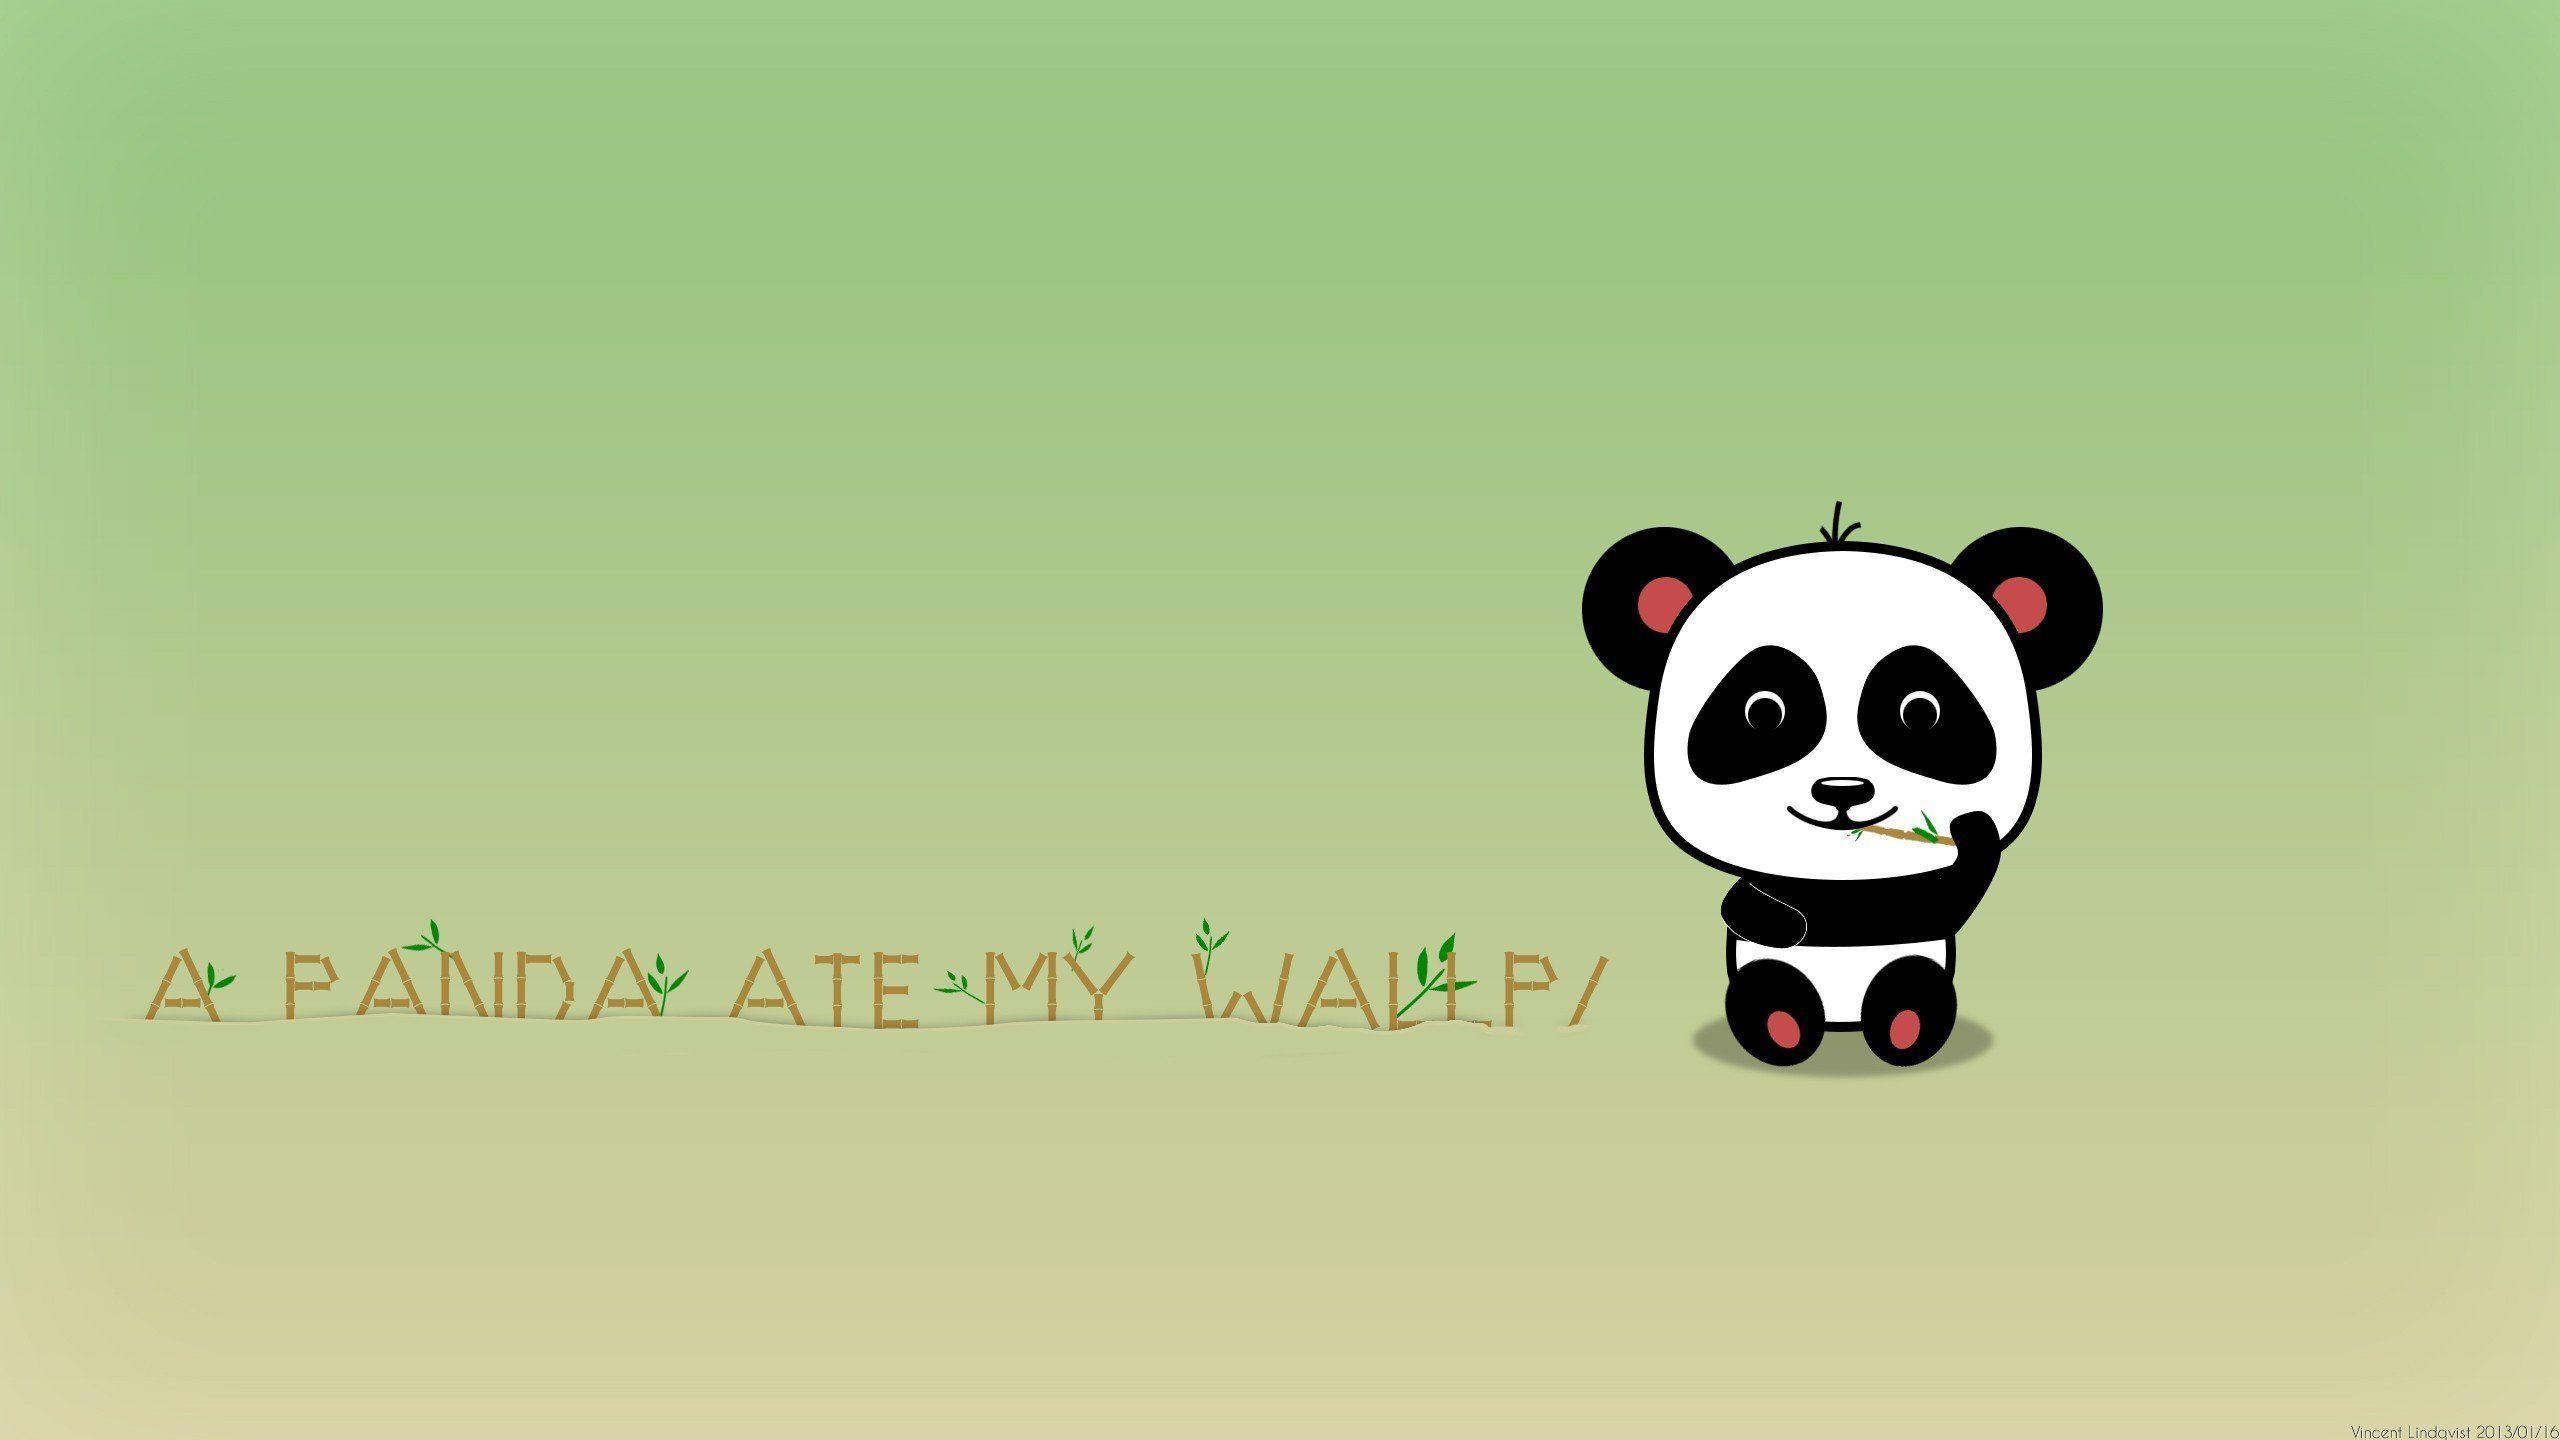 Cool Cartoon Panda Wallpapers - Top ...